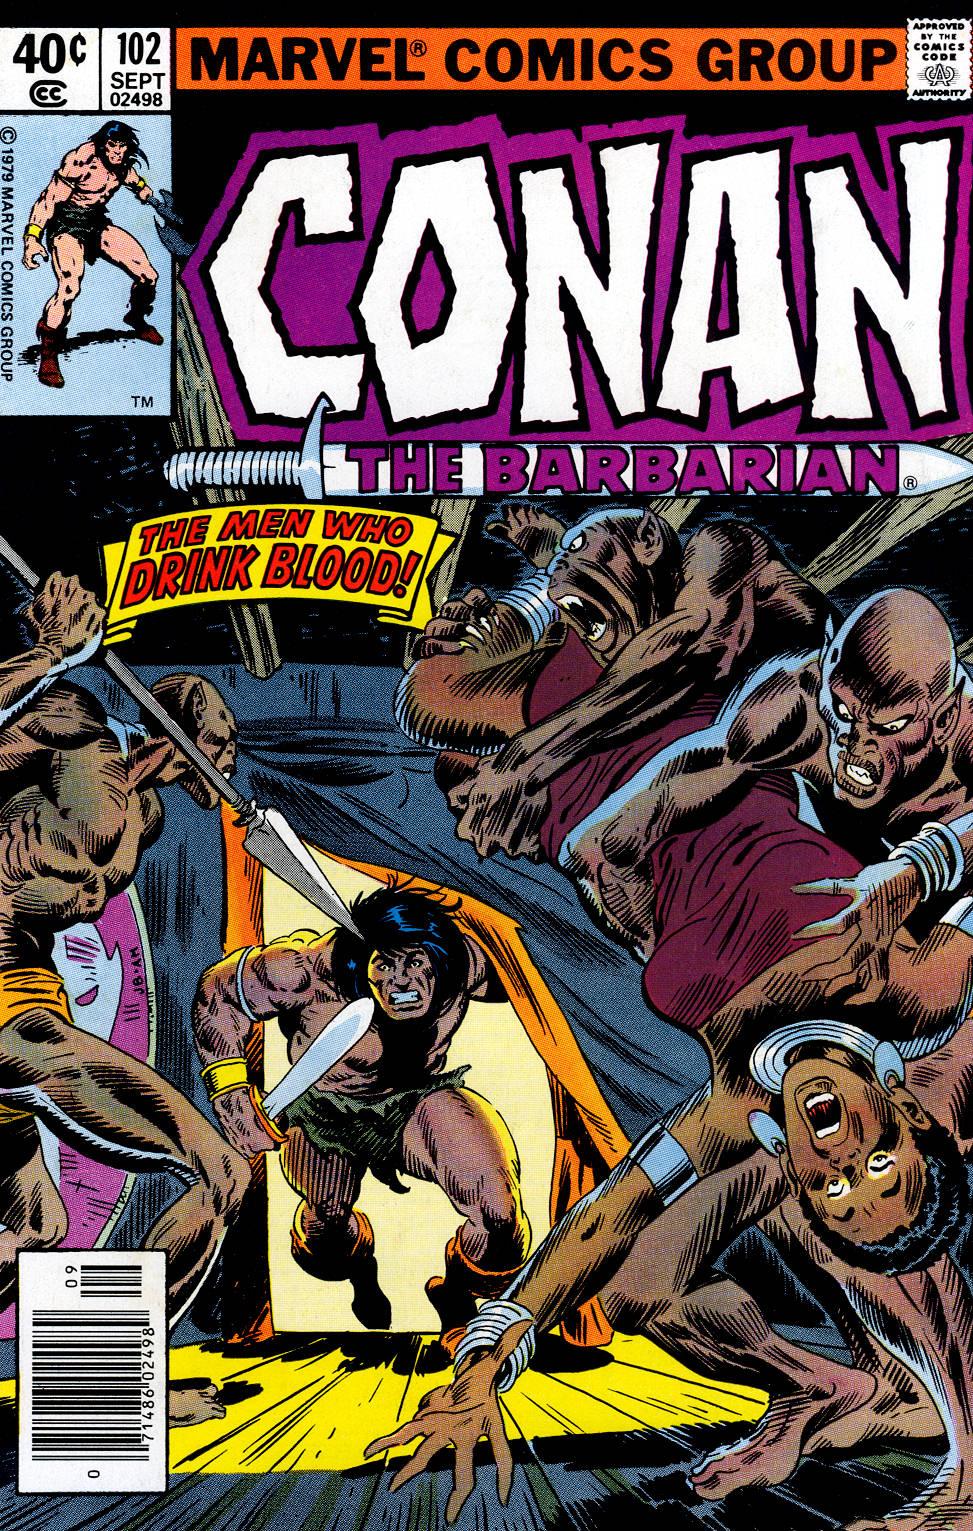 Conan the Barbarian (1970) Issue #102 #114 - English 1